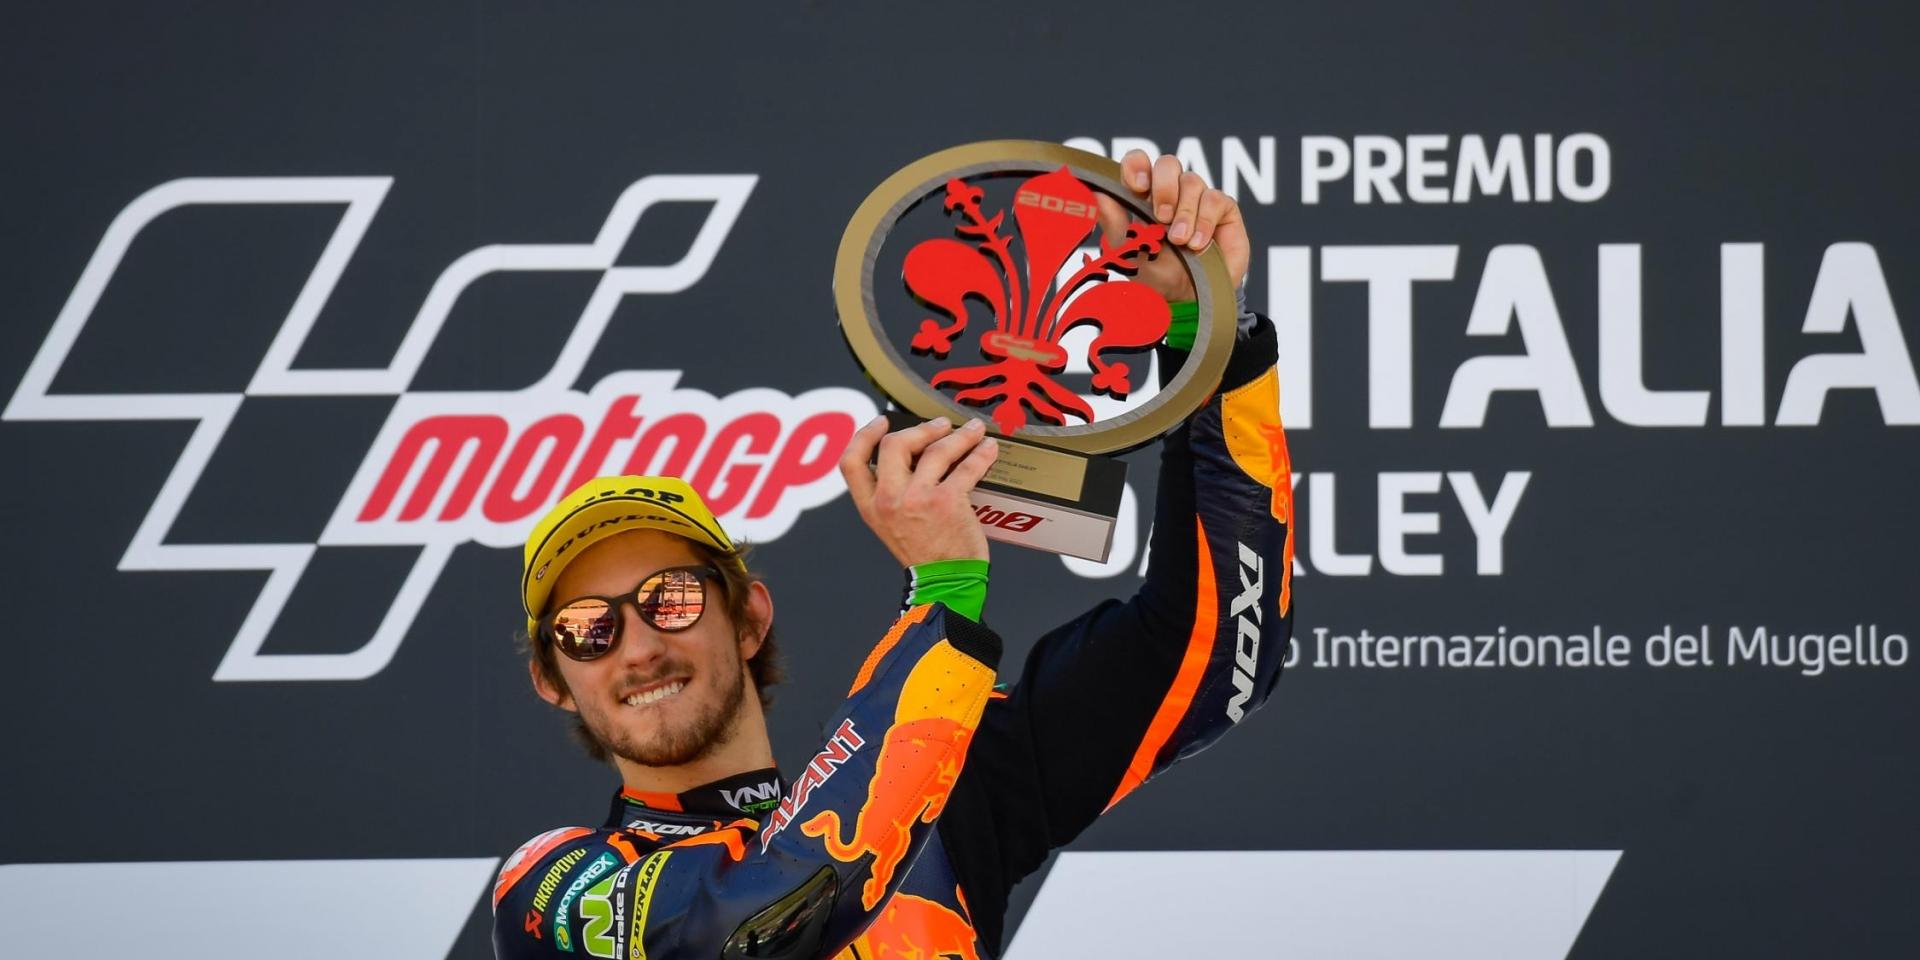 誰領便當?KTM Tech3車隊簽下Remy Gardner,2022年晉升MotoGP!